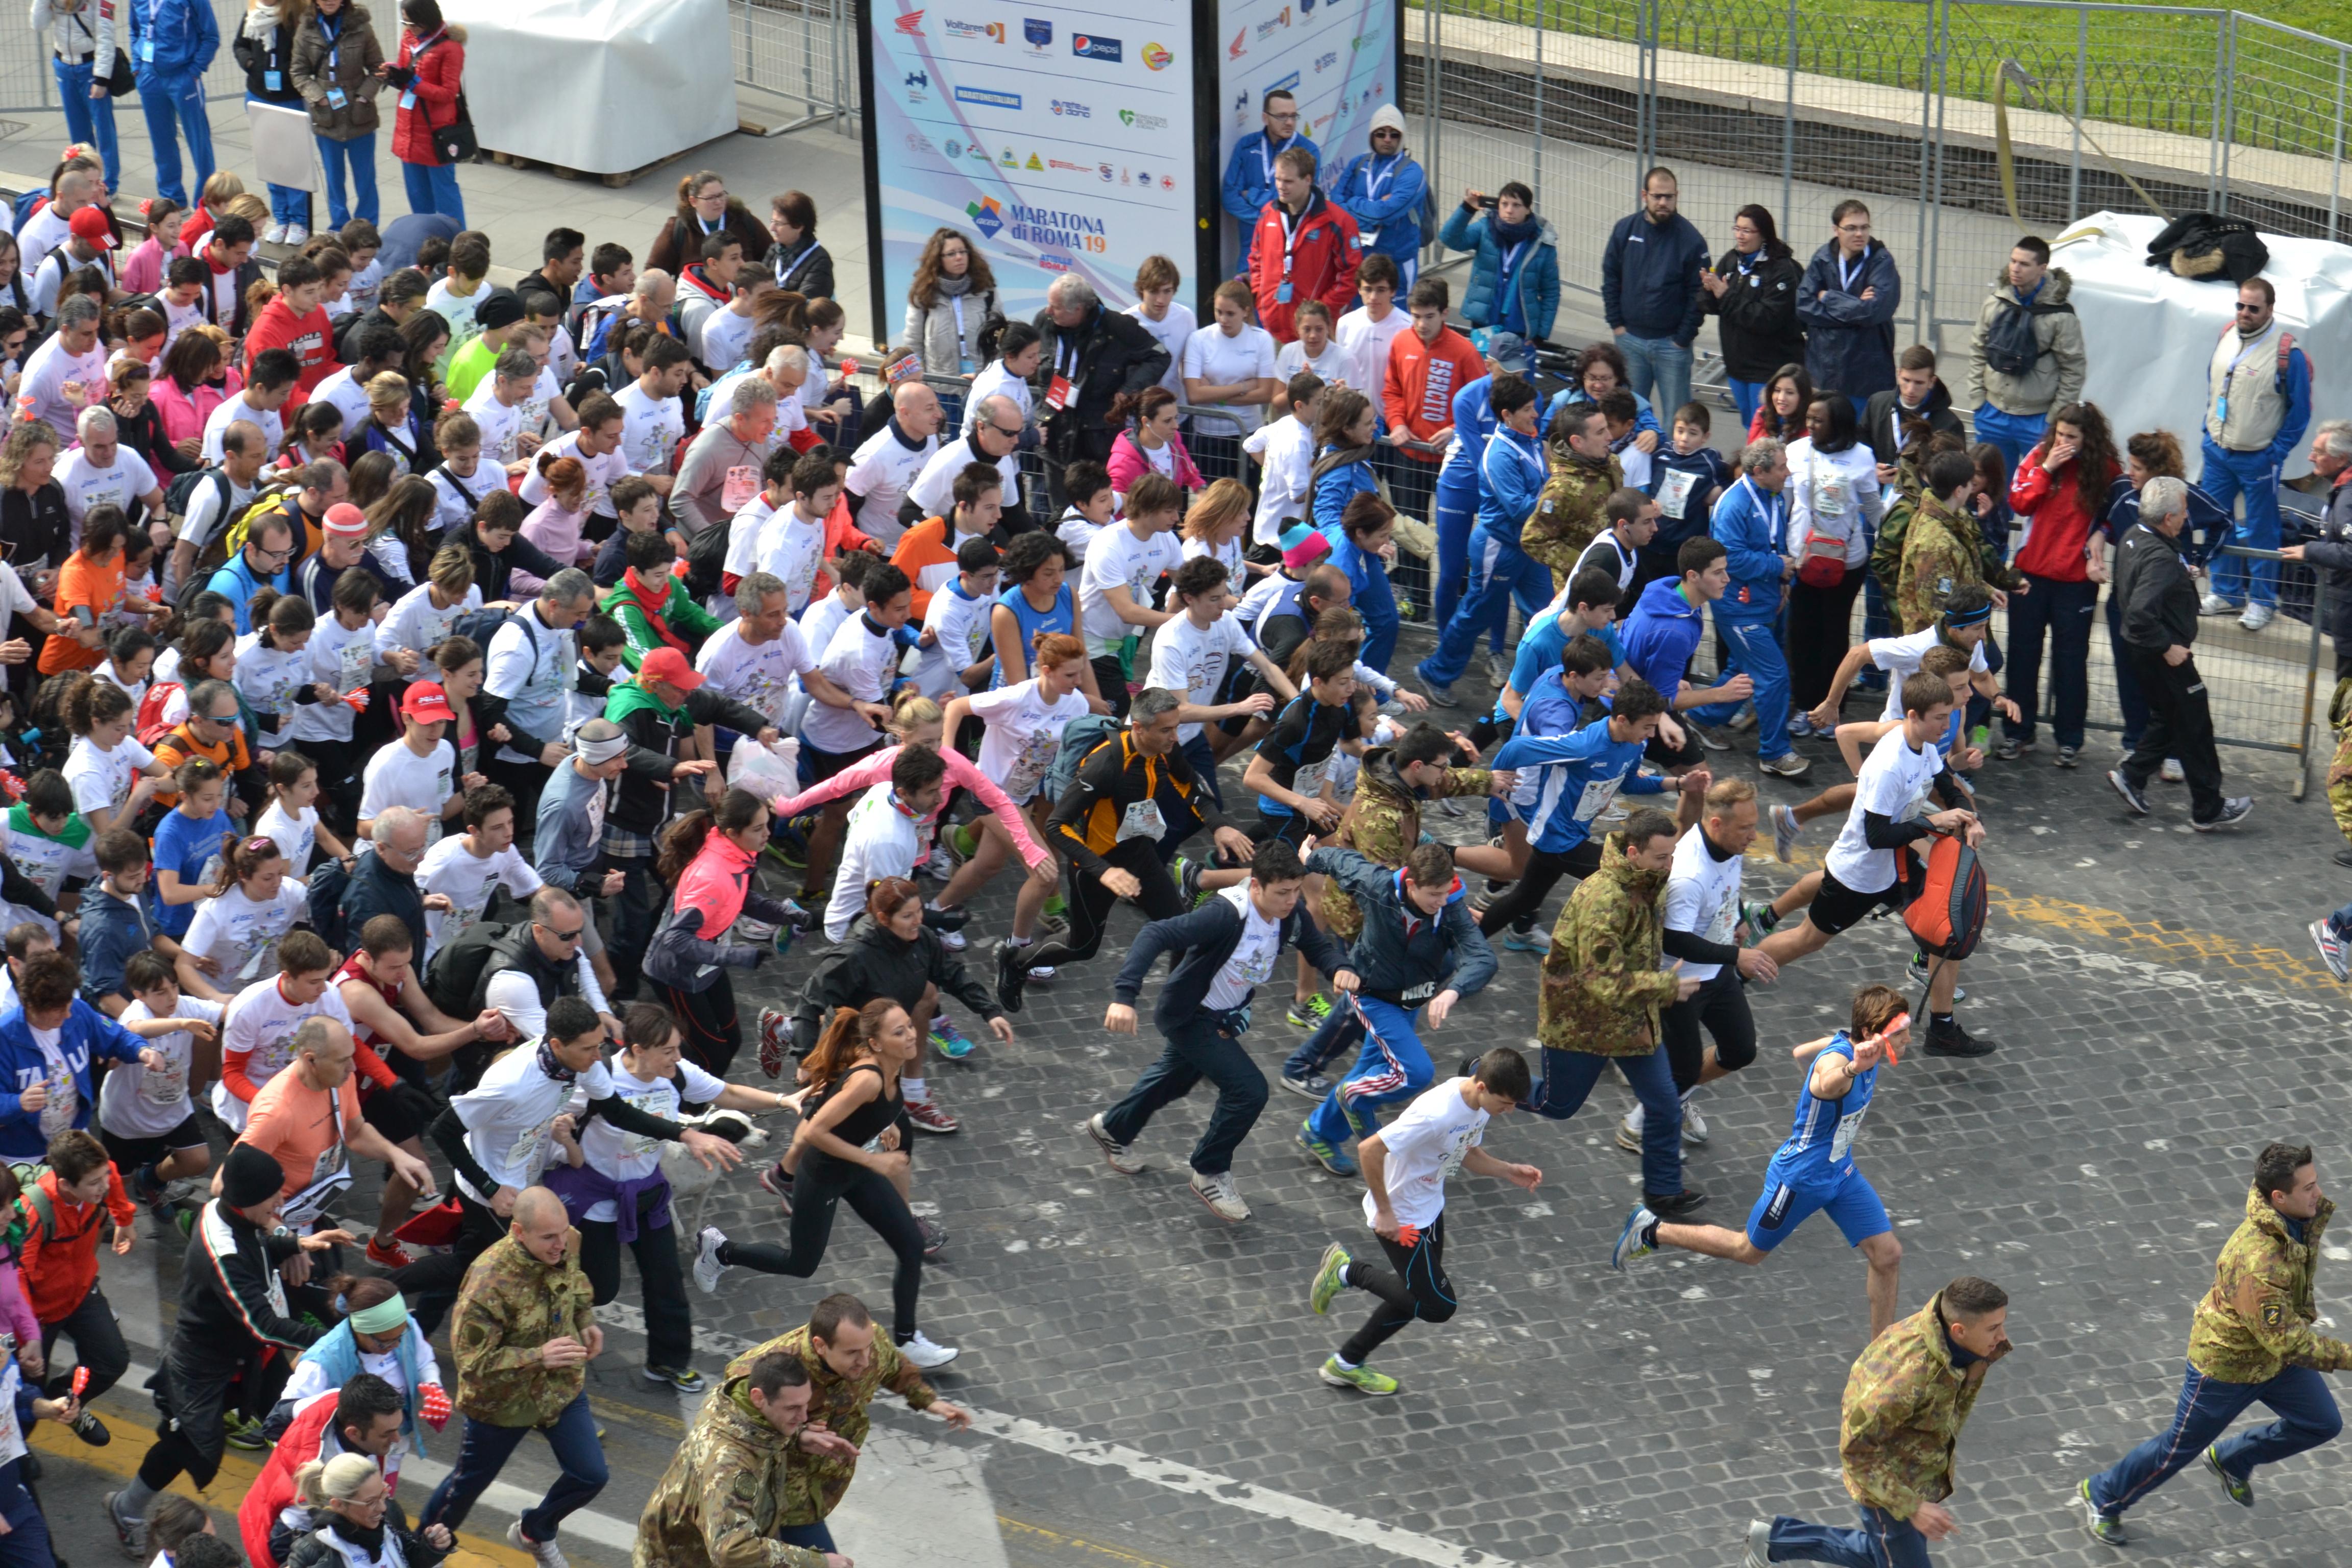 maratona-di-roma-2013-401